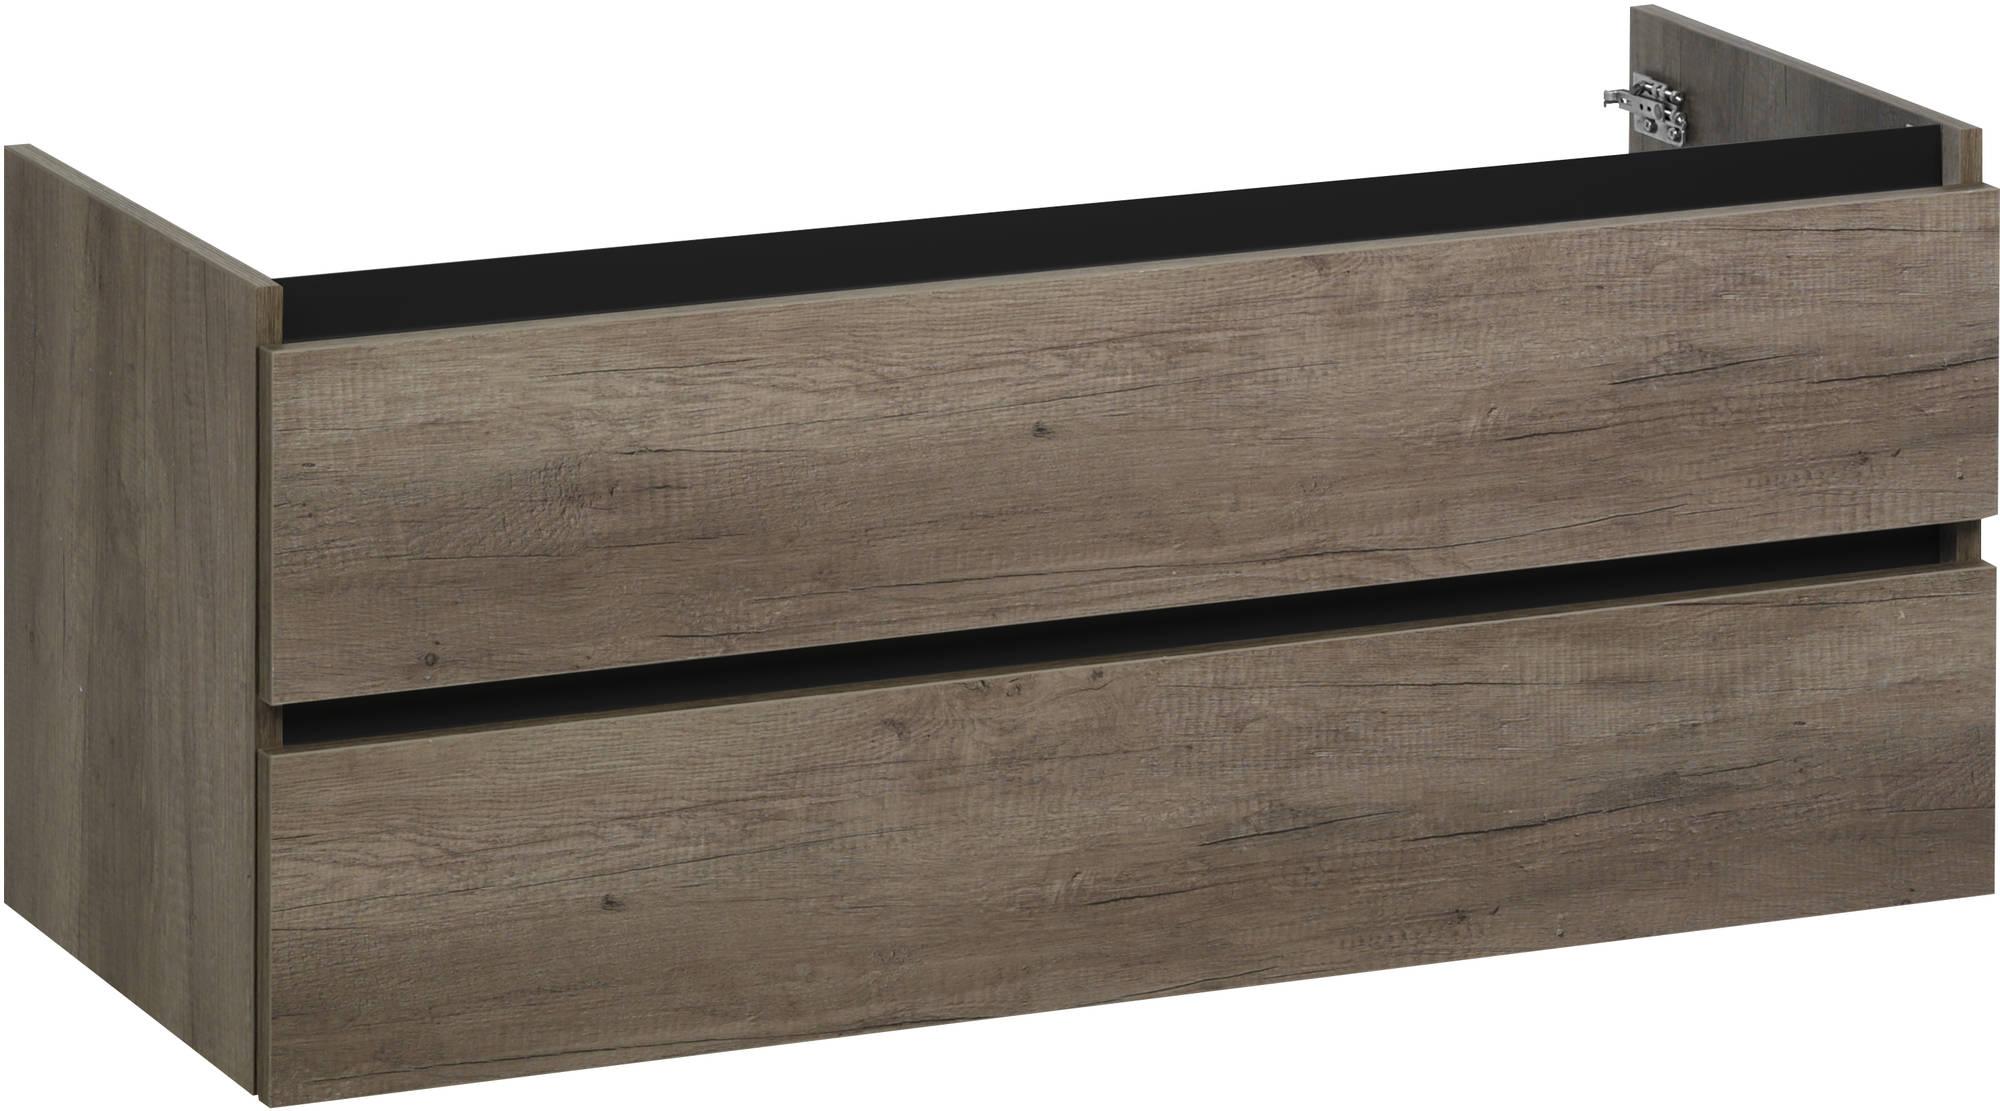 Ben Limara Wastafelonderkast 2 laden, 140x44,5x50 cm, Nebraska Eiken mat zwart